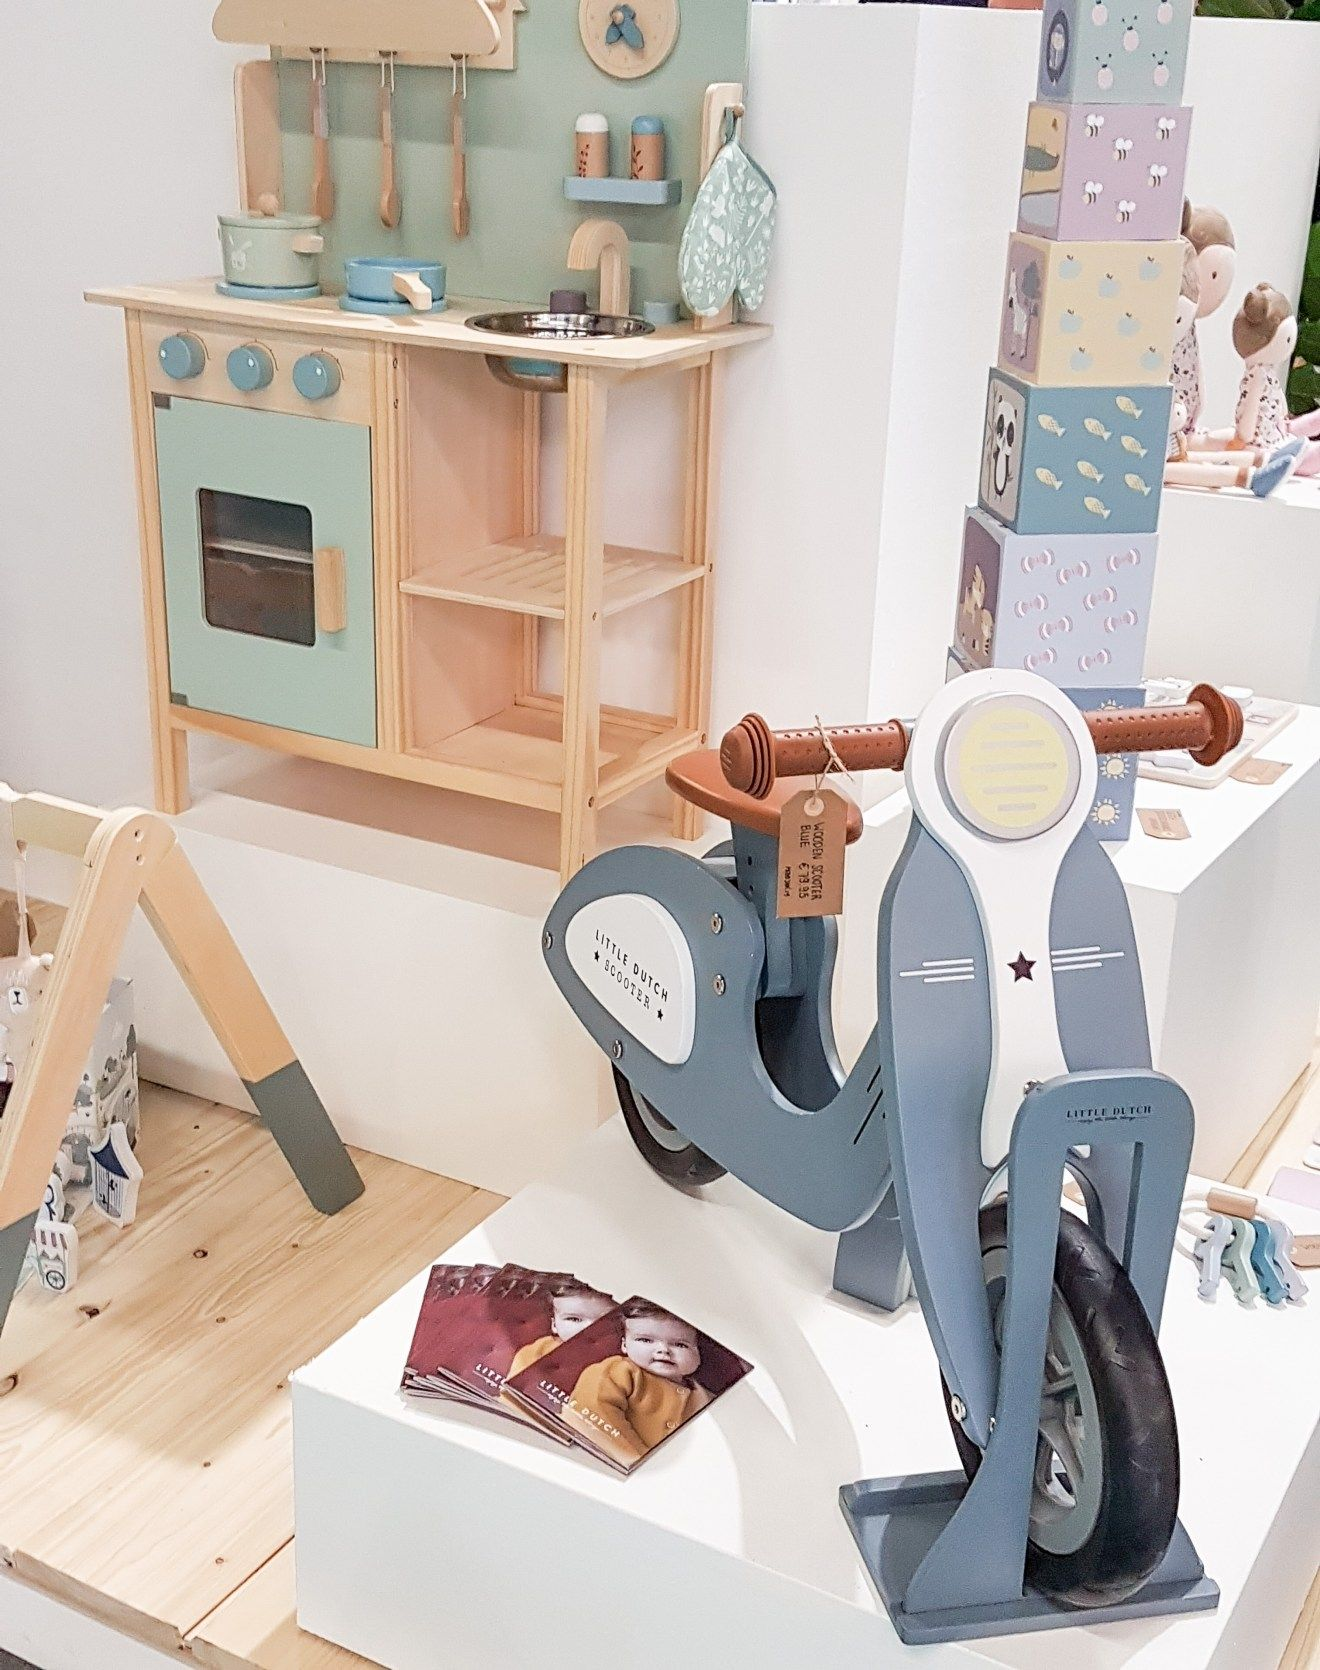 Die Köln Messe Highlights der Kind & Jugend - Trends für ...